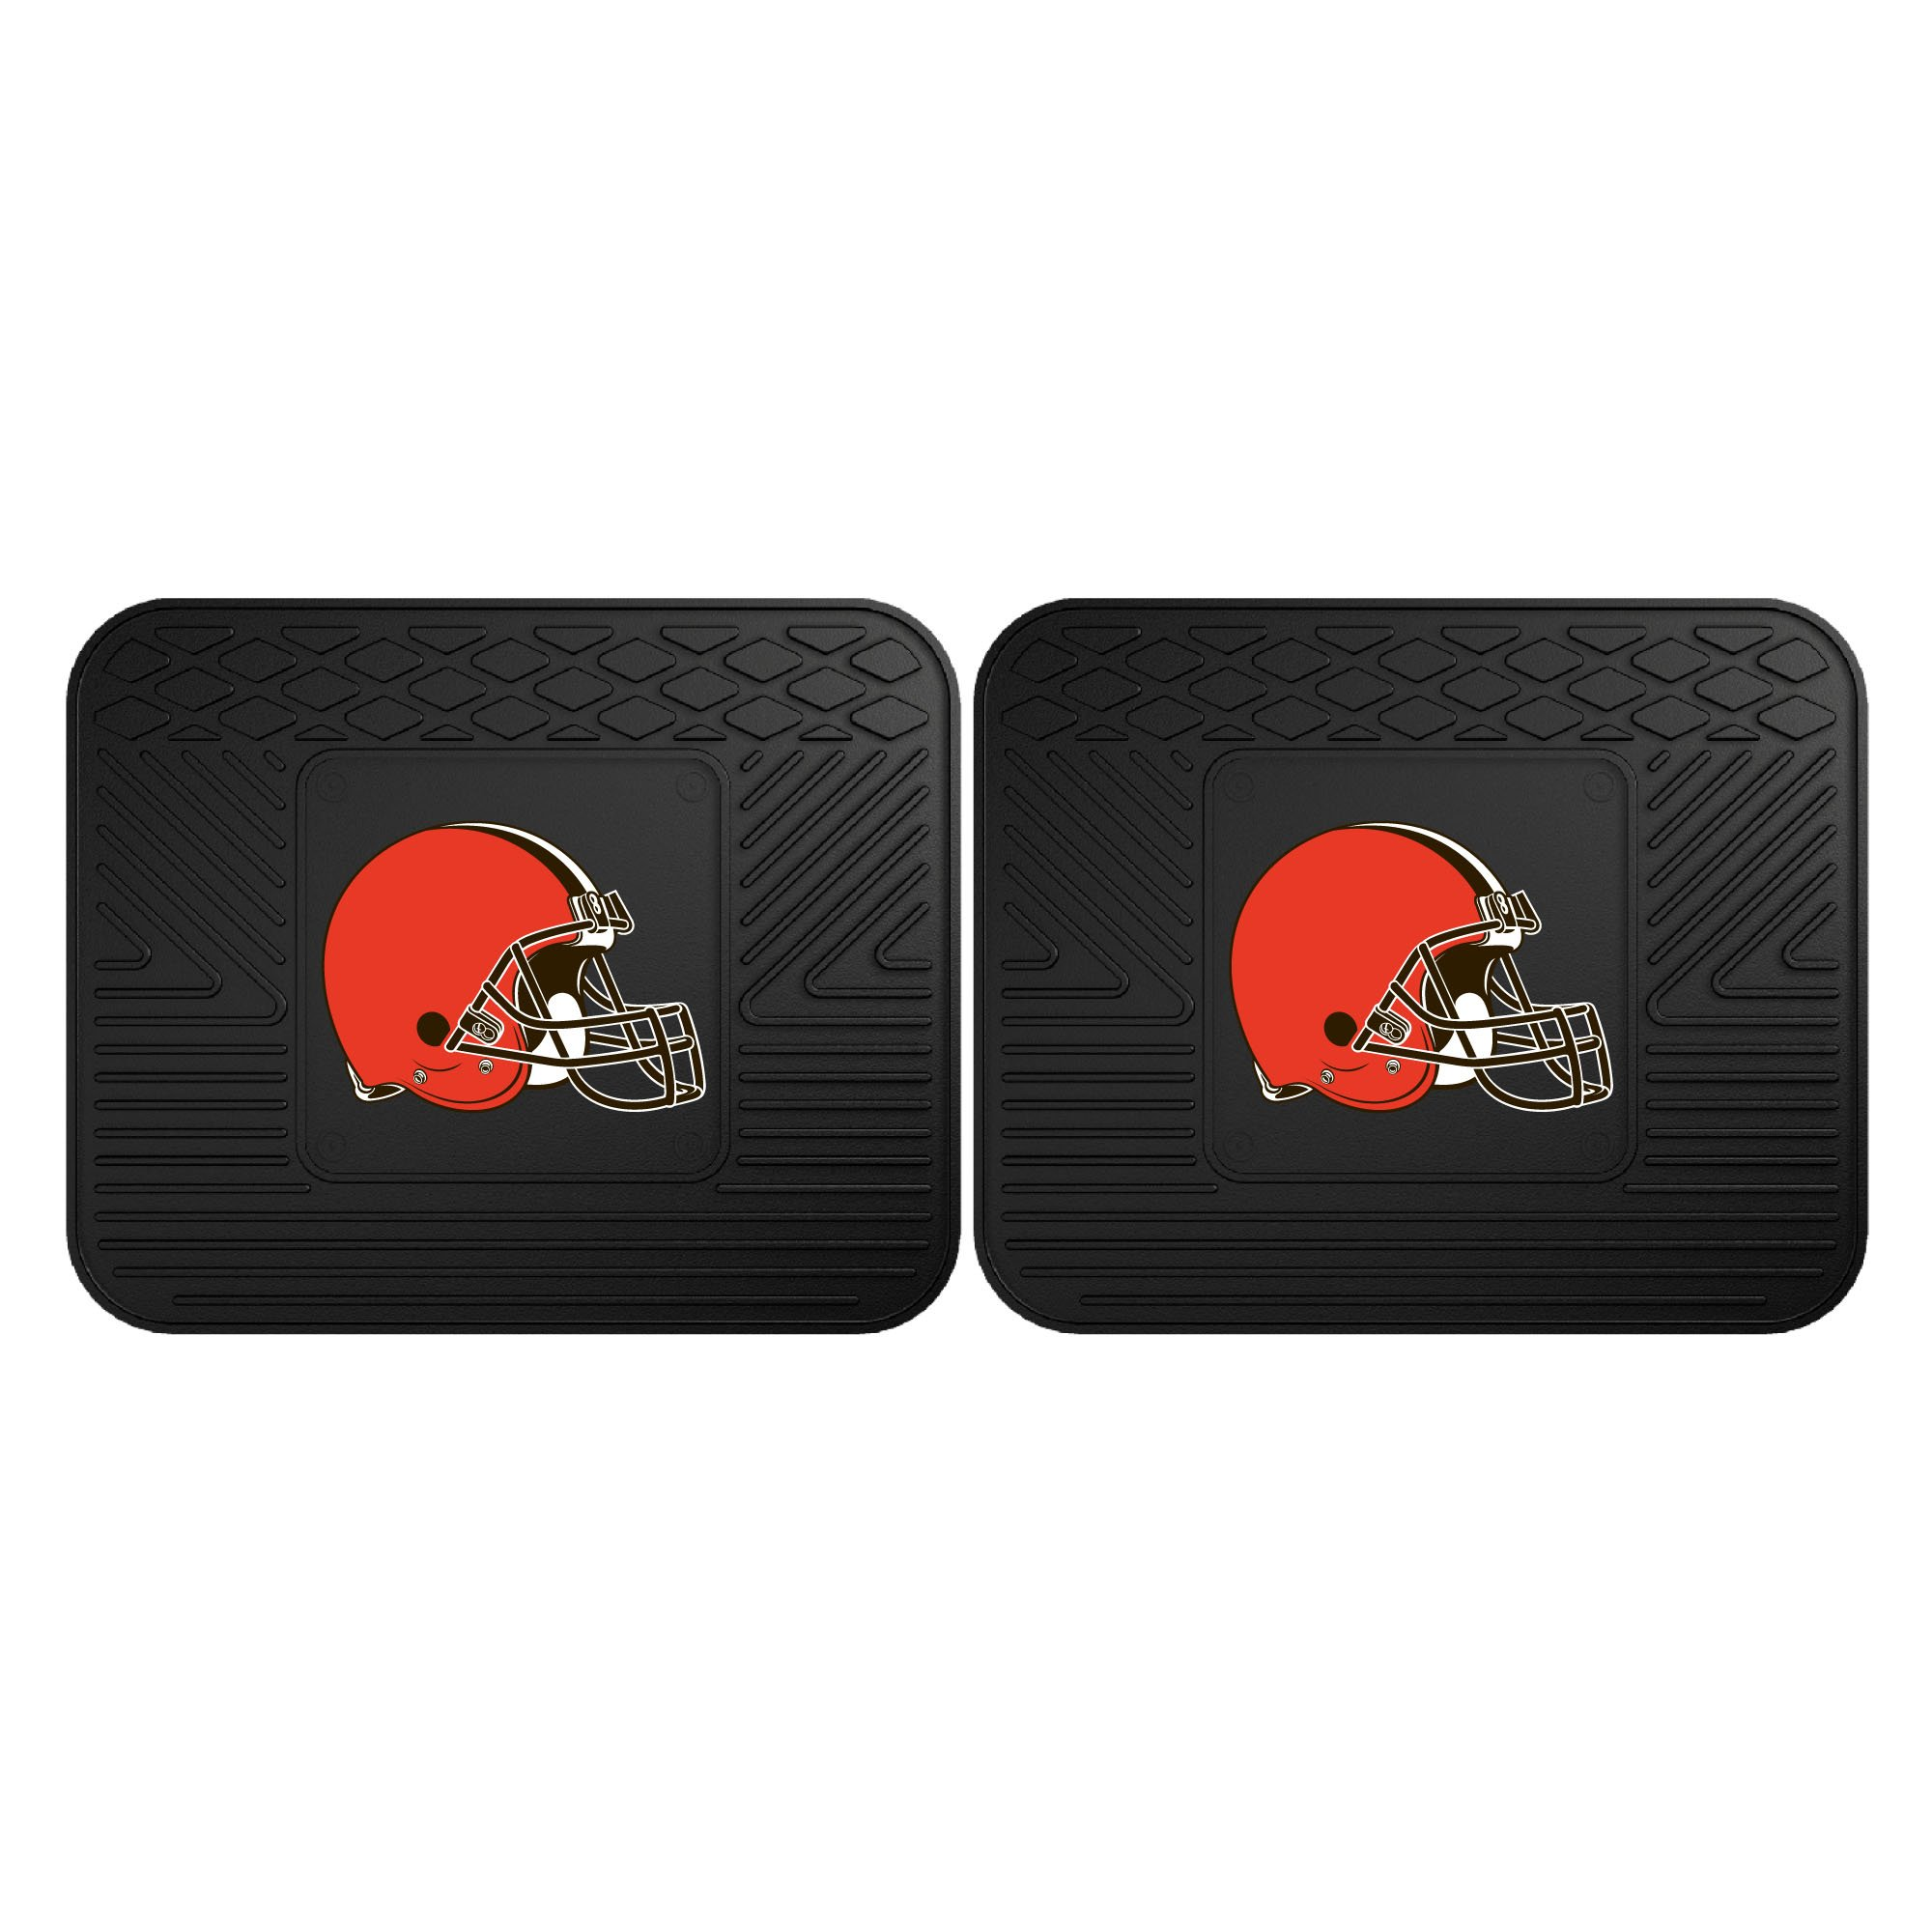 Fanmats 12354 NFL - Cleveland Browns Utility Mat - 2 Piece